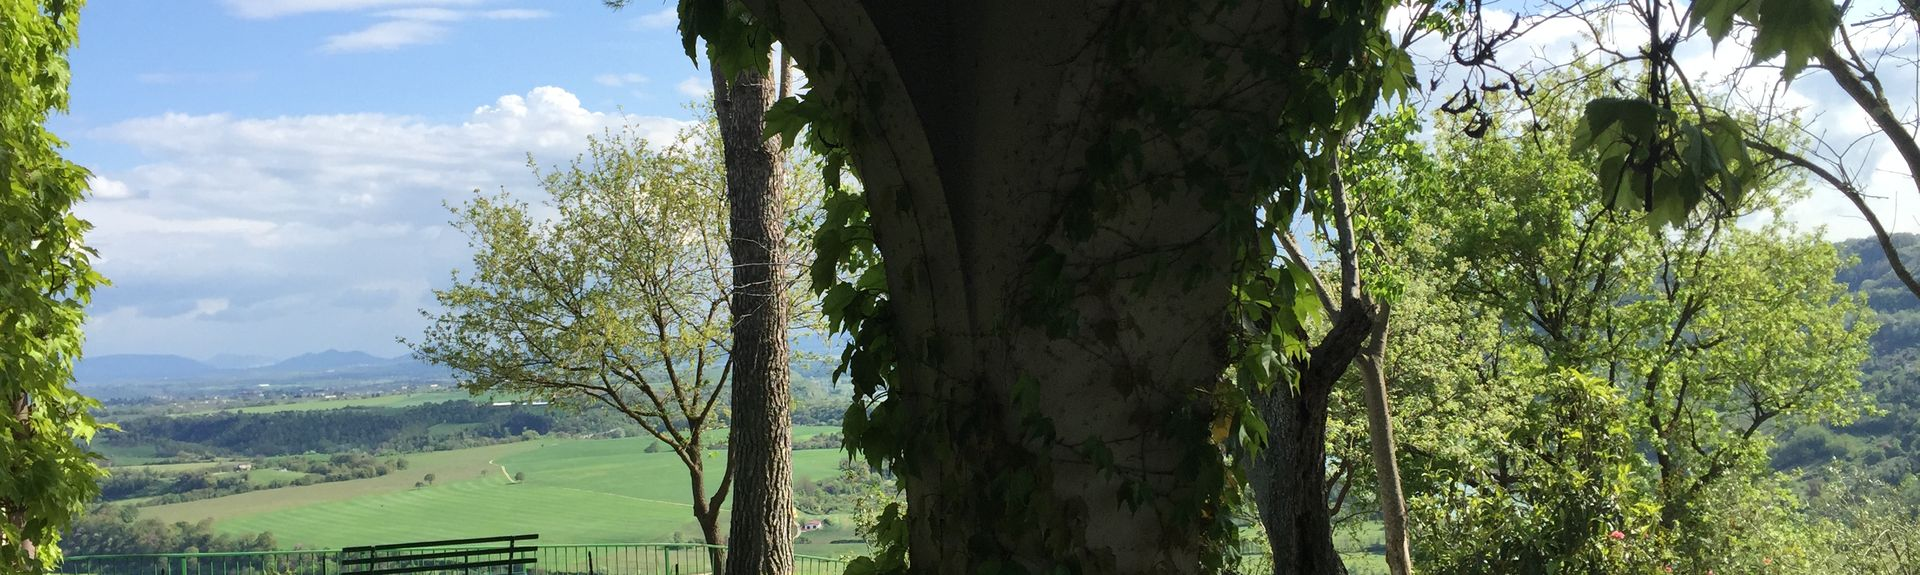 Monterotondo, Lácio, Itália